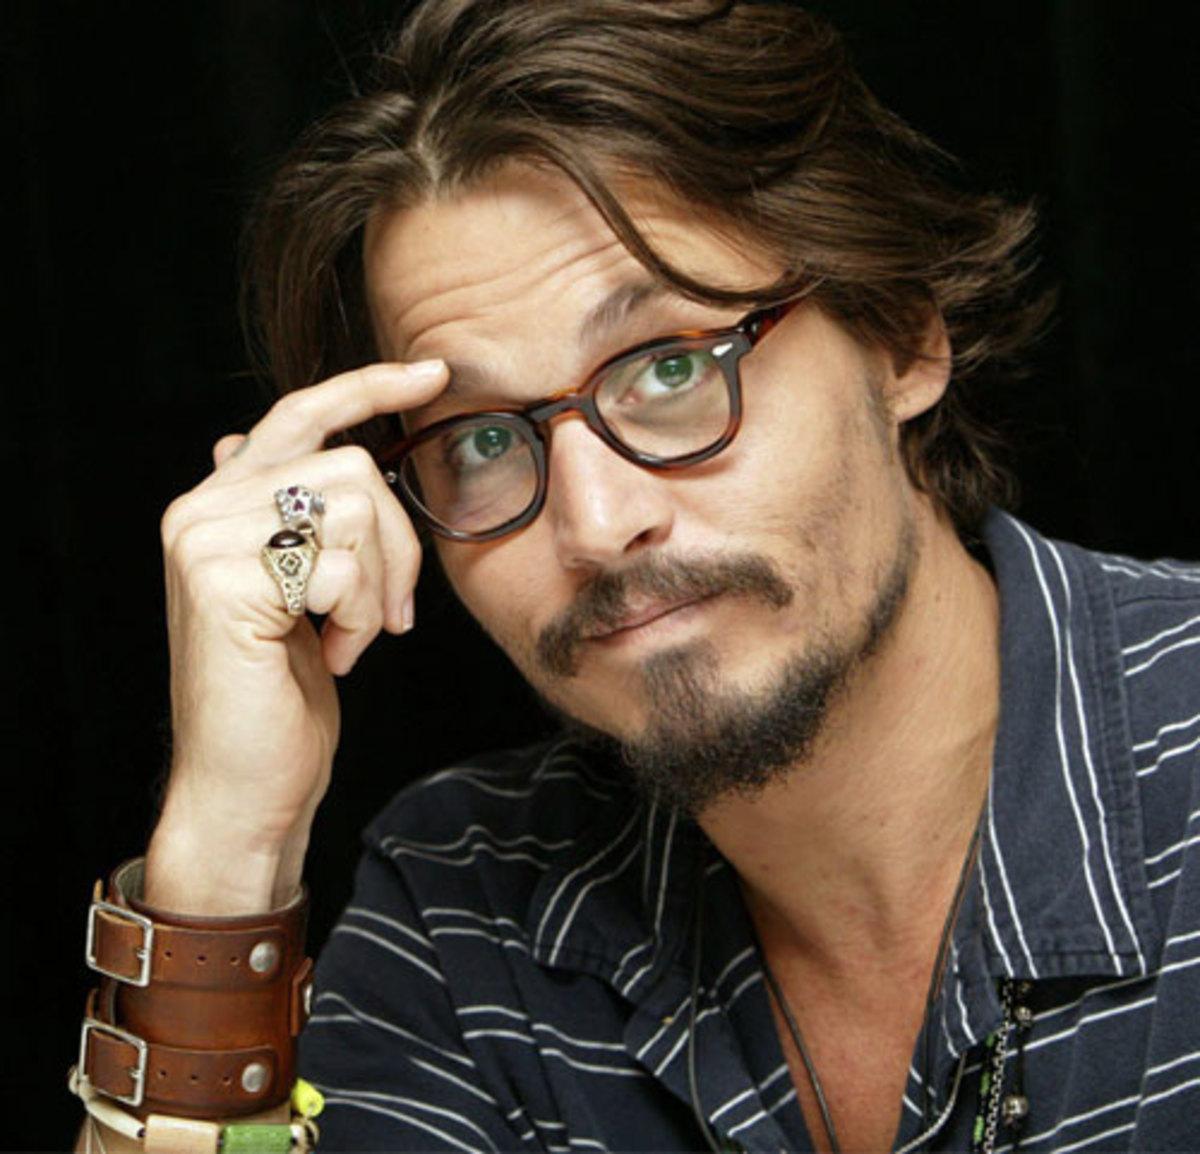 Johnny Depp Makes Glasses Look Amazing